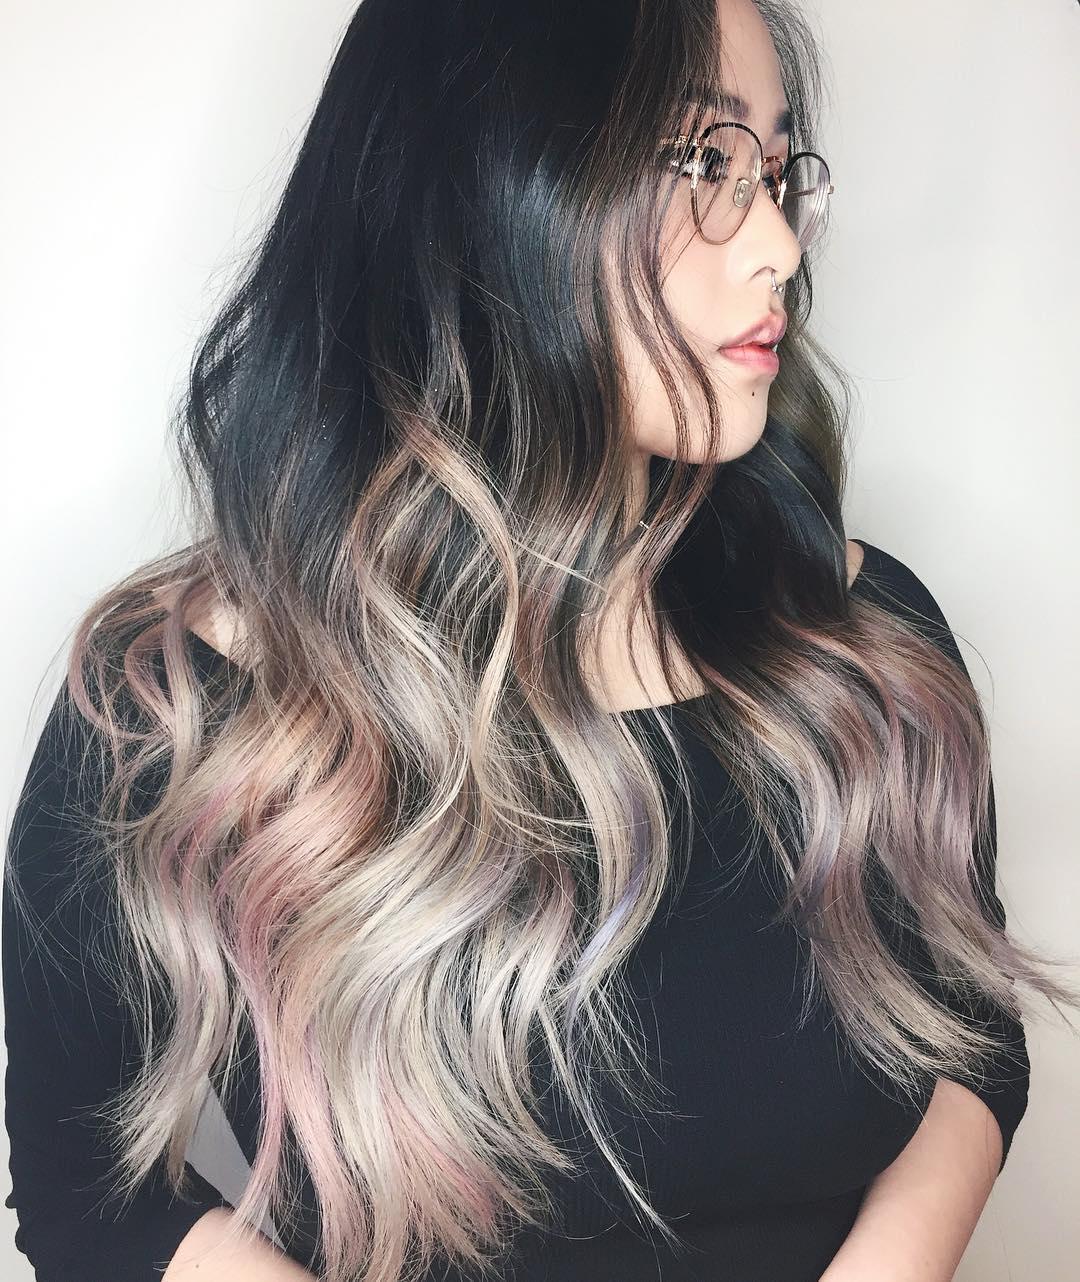 chrisweberhair-pink-highlights-for-black-hair